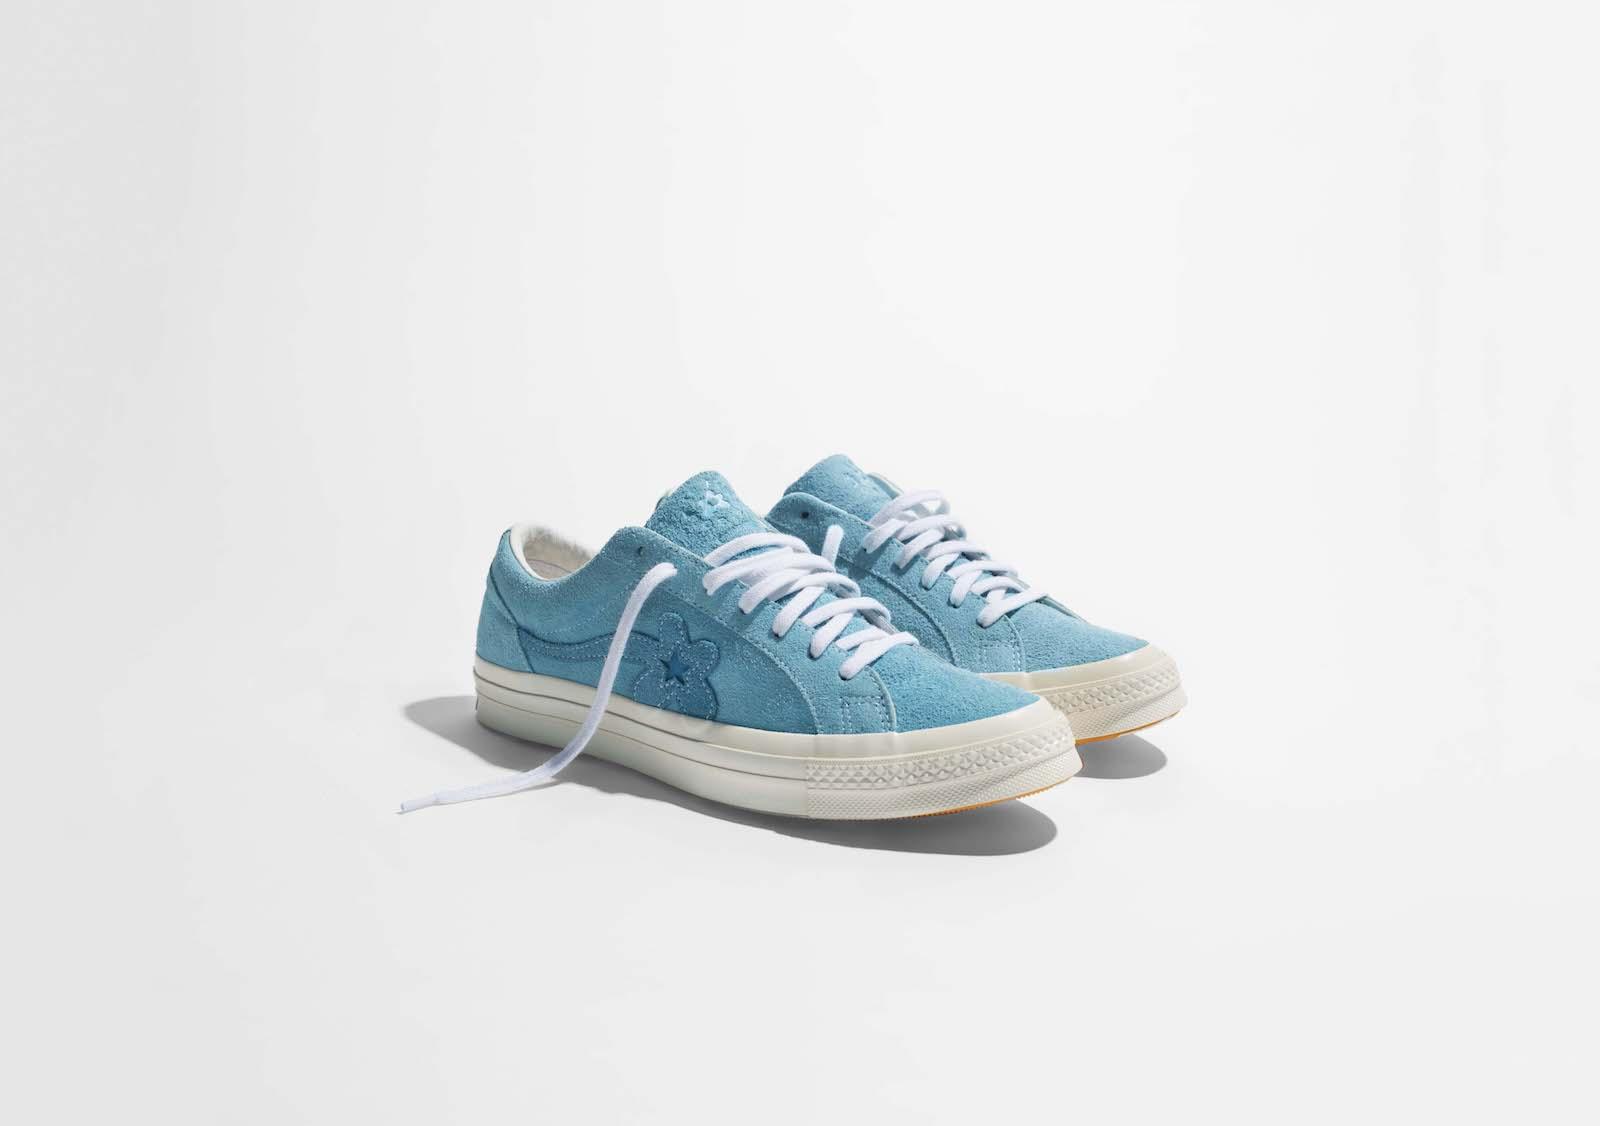 Converse golf le fleur one star release date sneakers for Les fleur